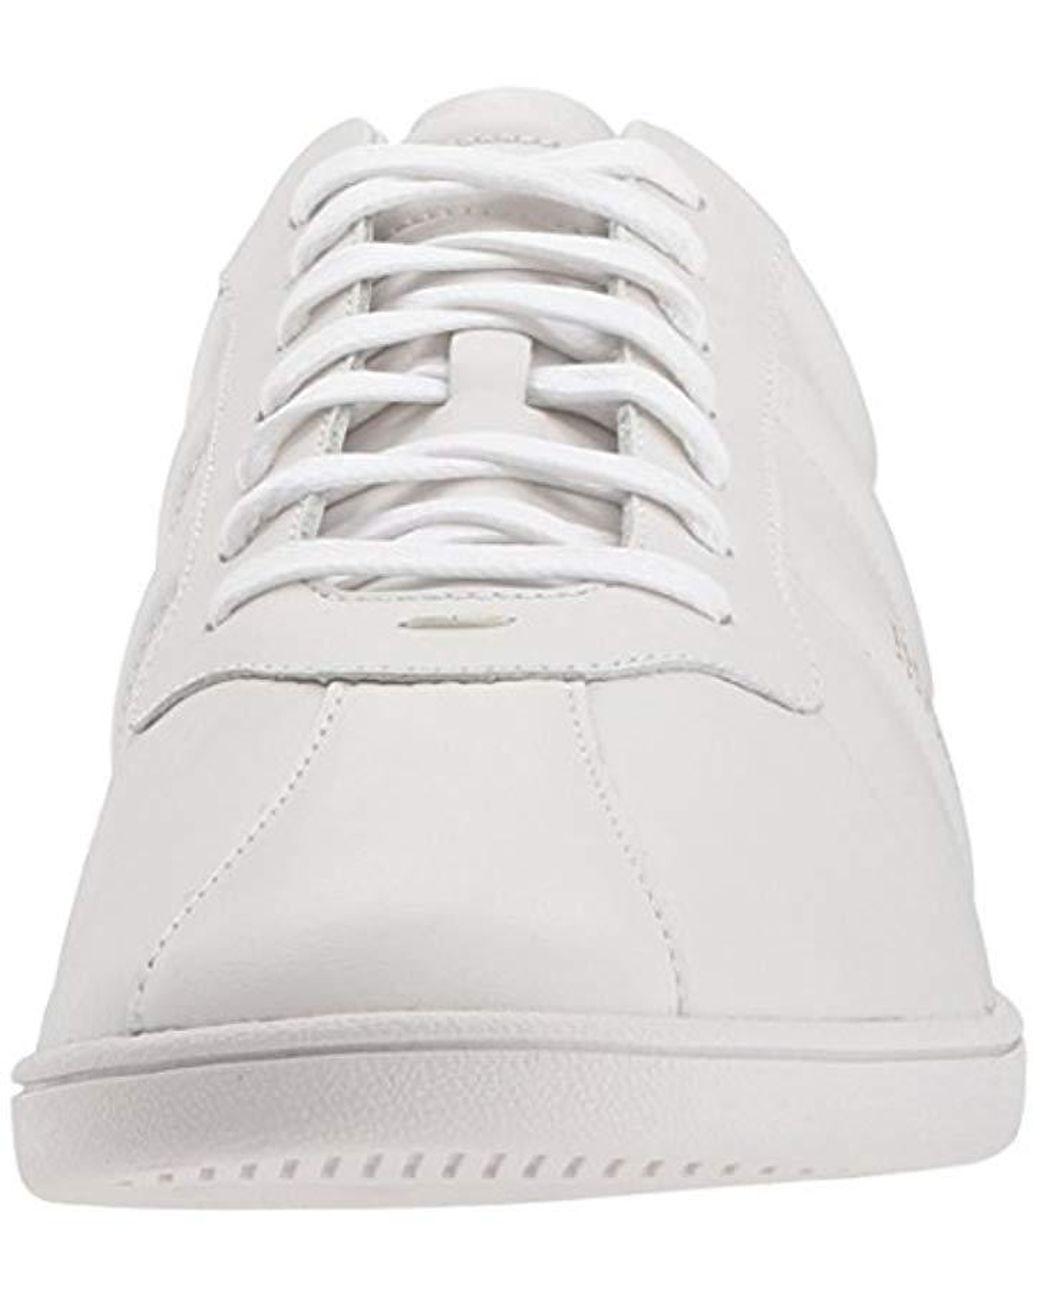 5bffe73d4bf BOSS Boss Orange Rumba Leather Tennis Sneaker Construction Shoe in White -  Save 20% - Lyst